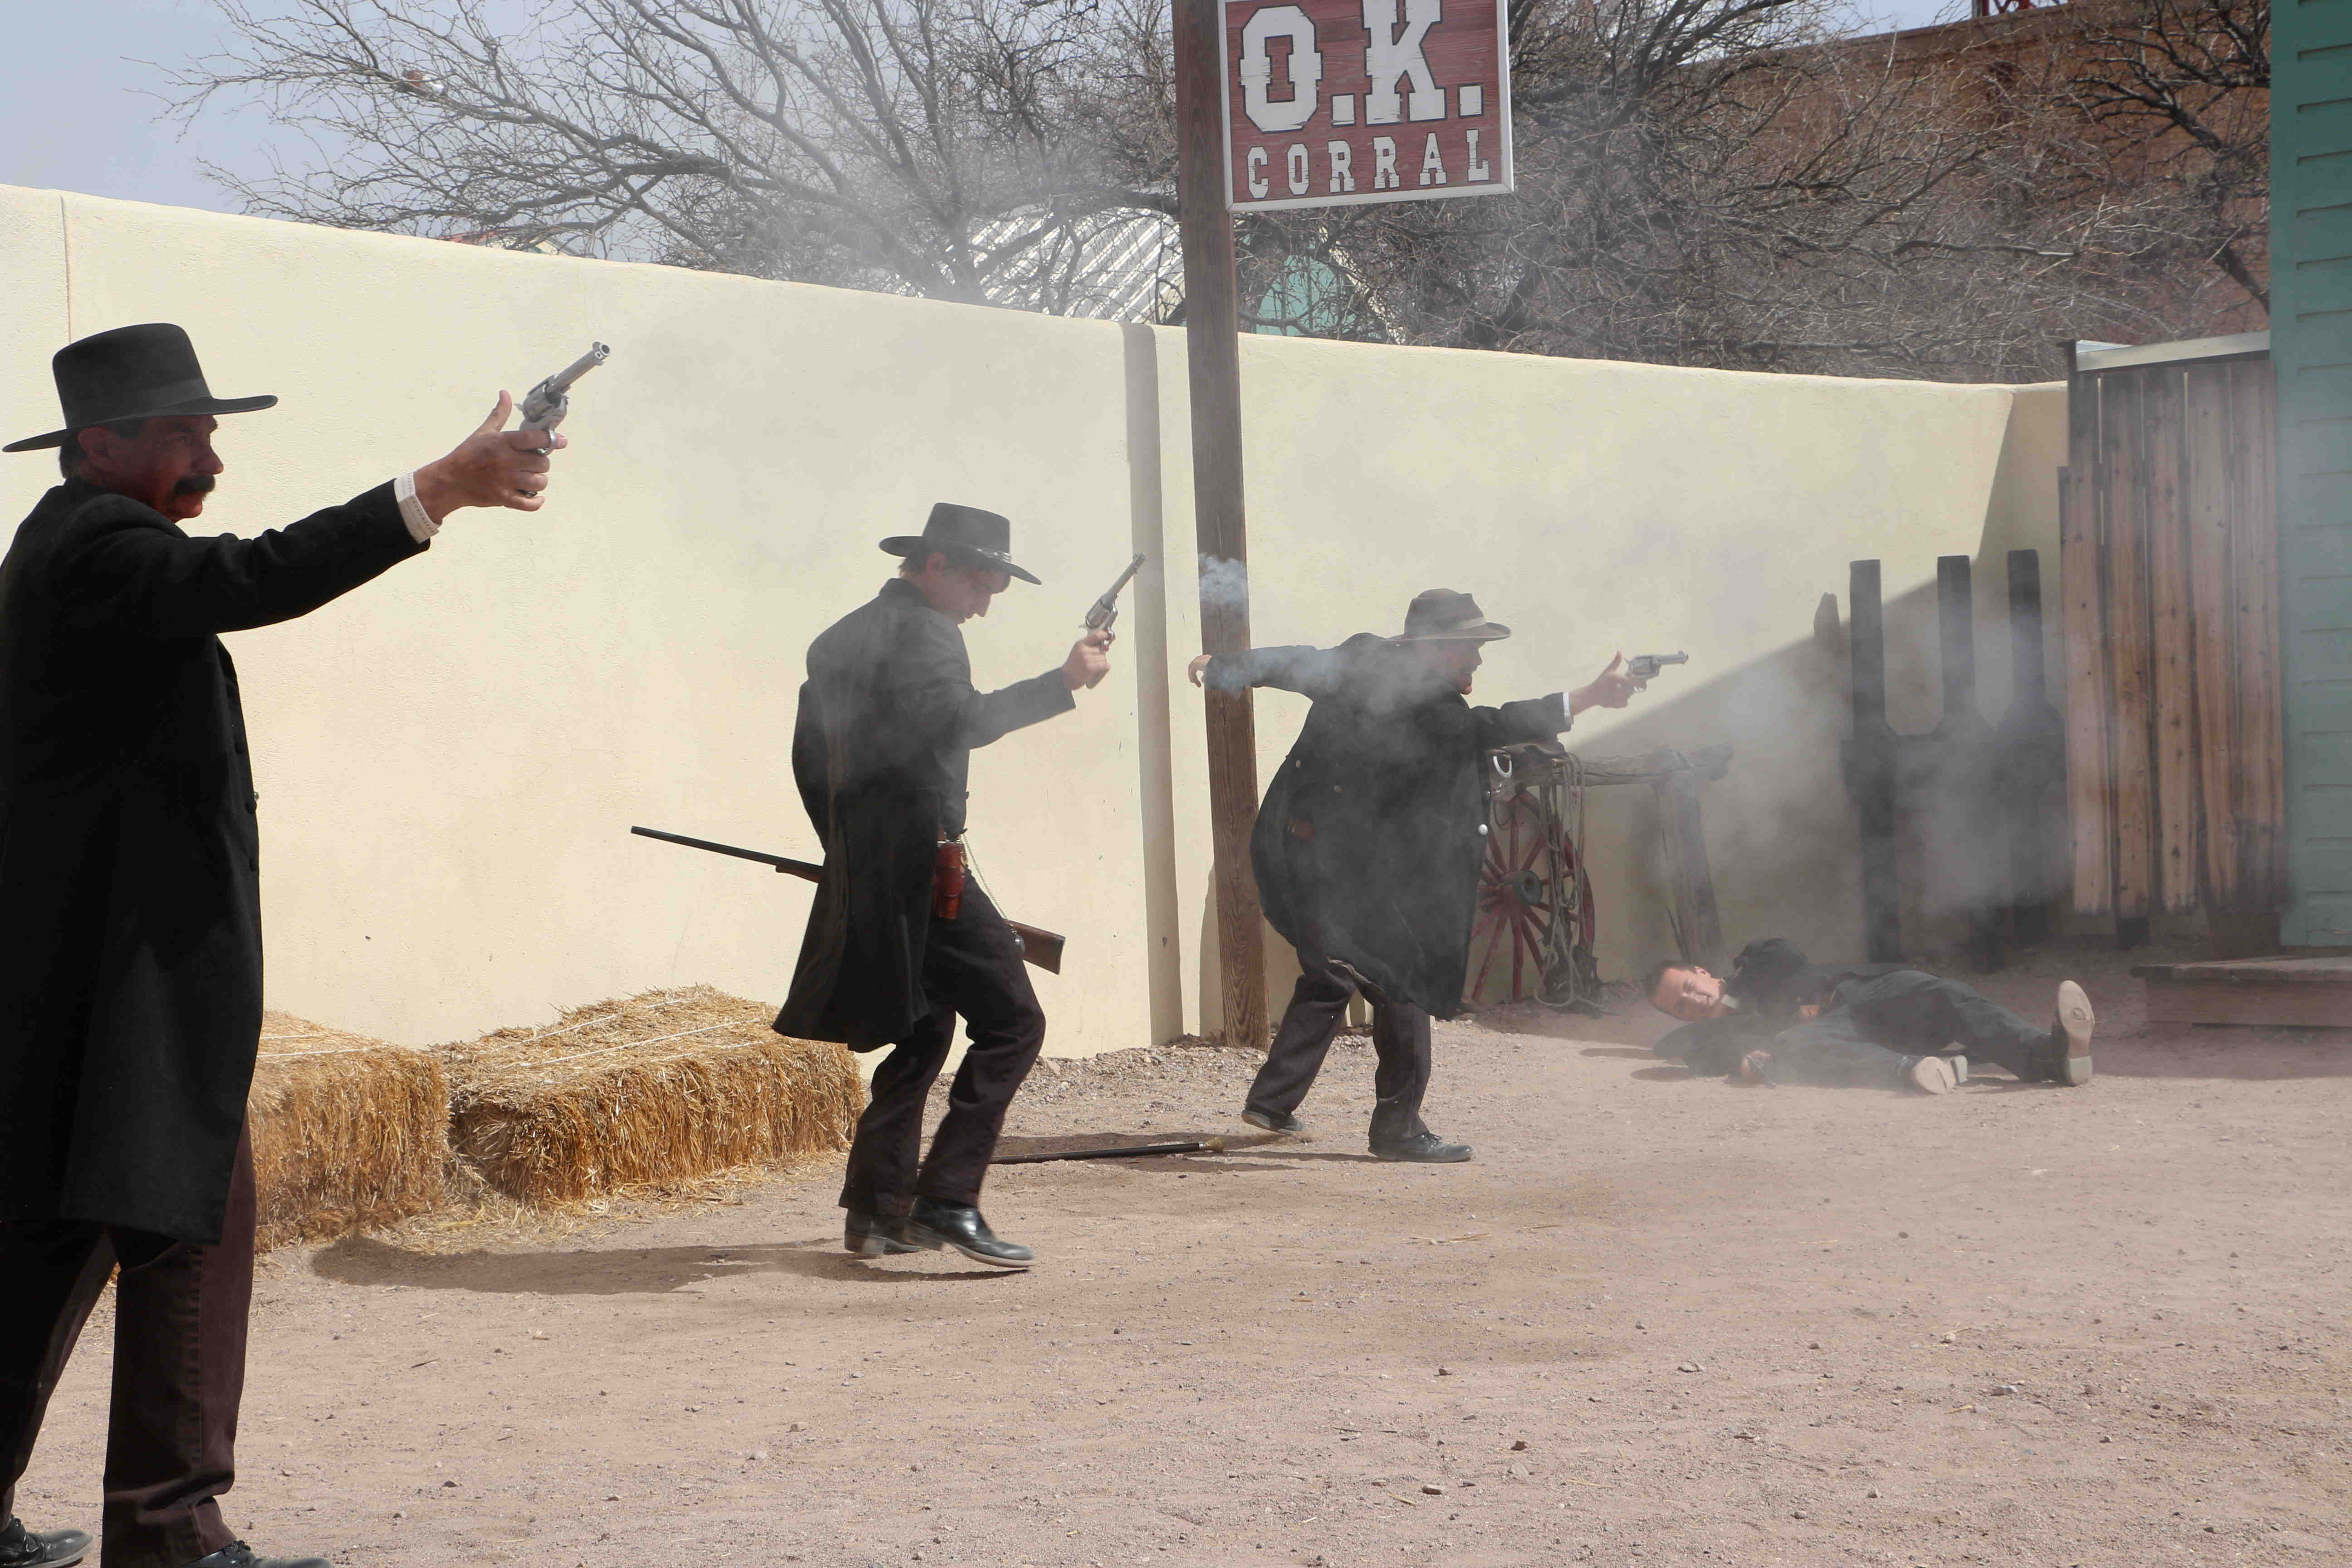 O K  Corral Gunfight Site, Tombstone AZ: History